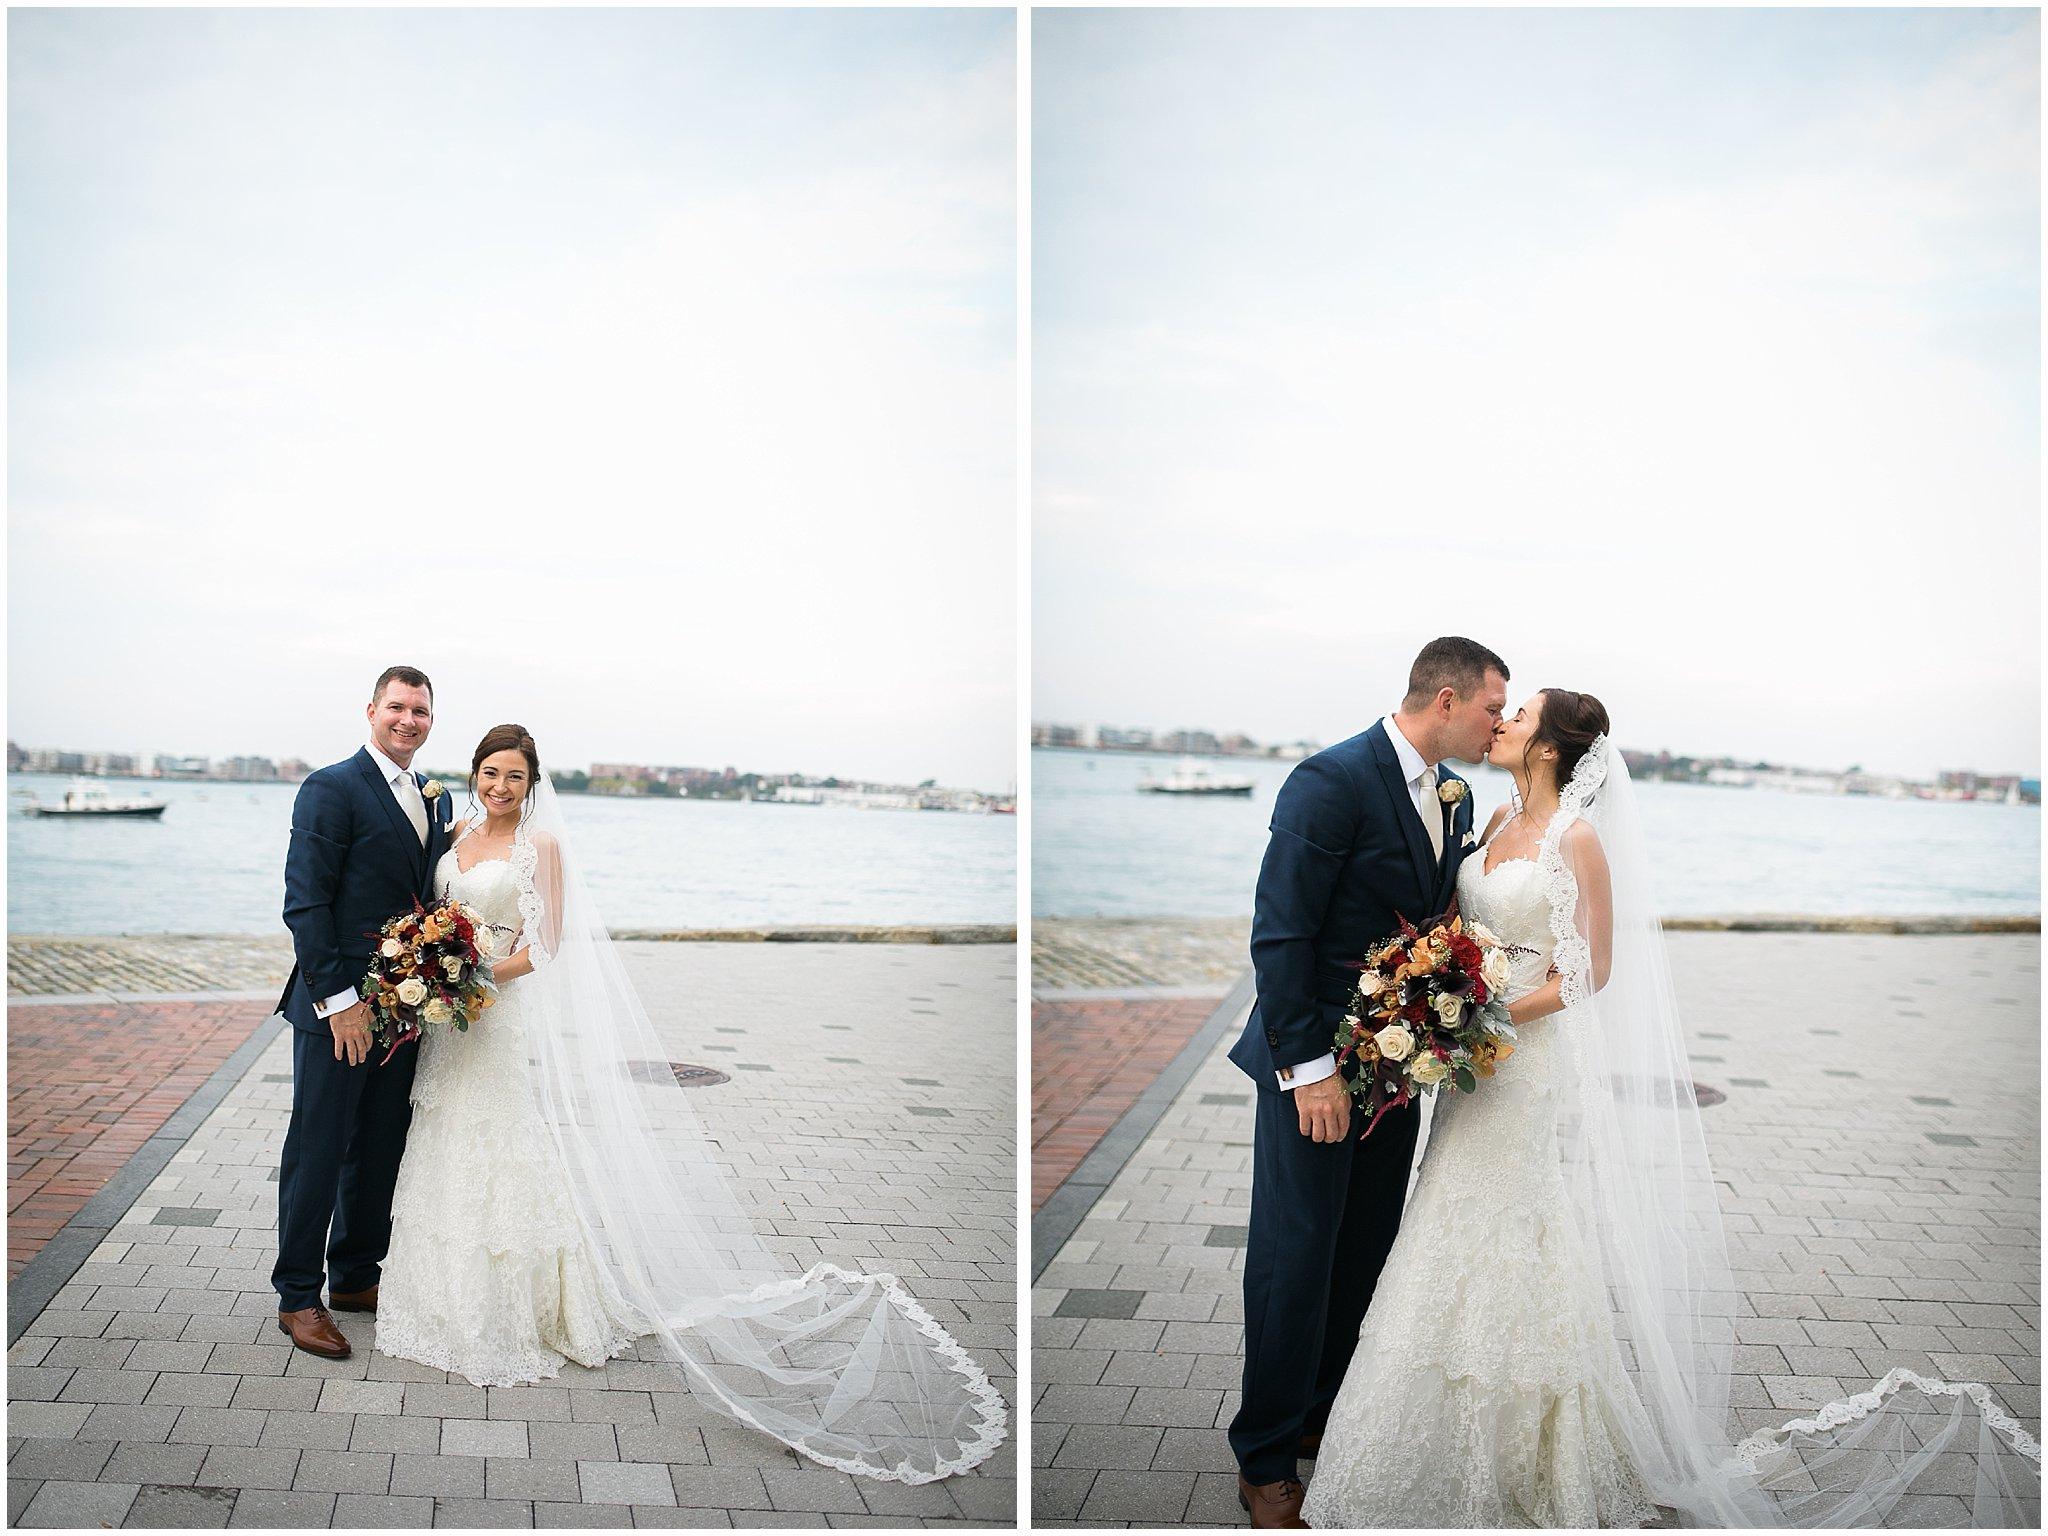 Seaport Hotel Wedding Boston Photographer Sweet Alice42.jpg